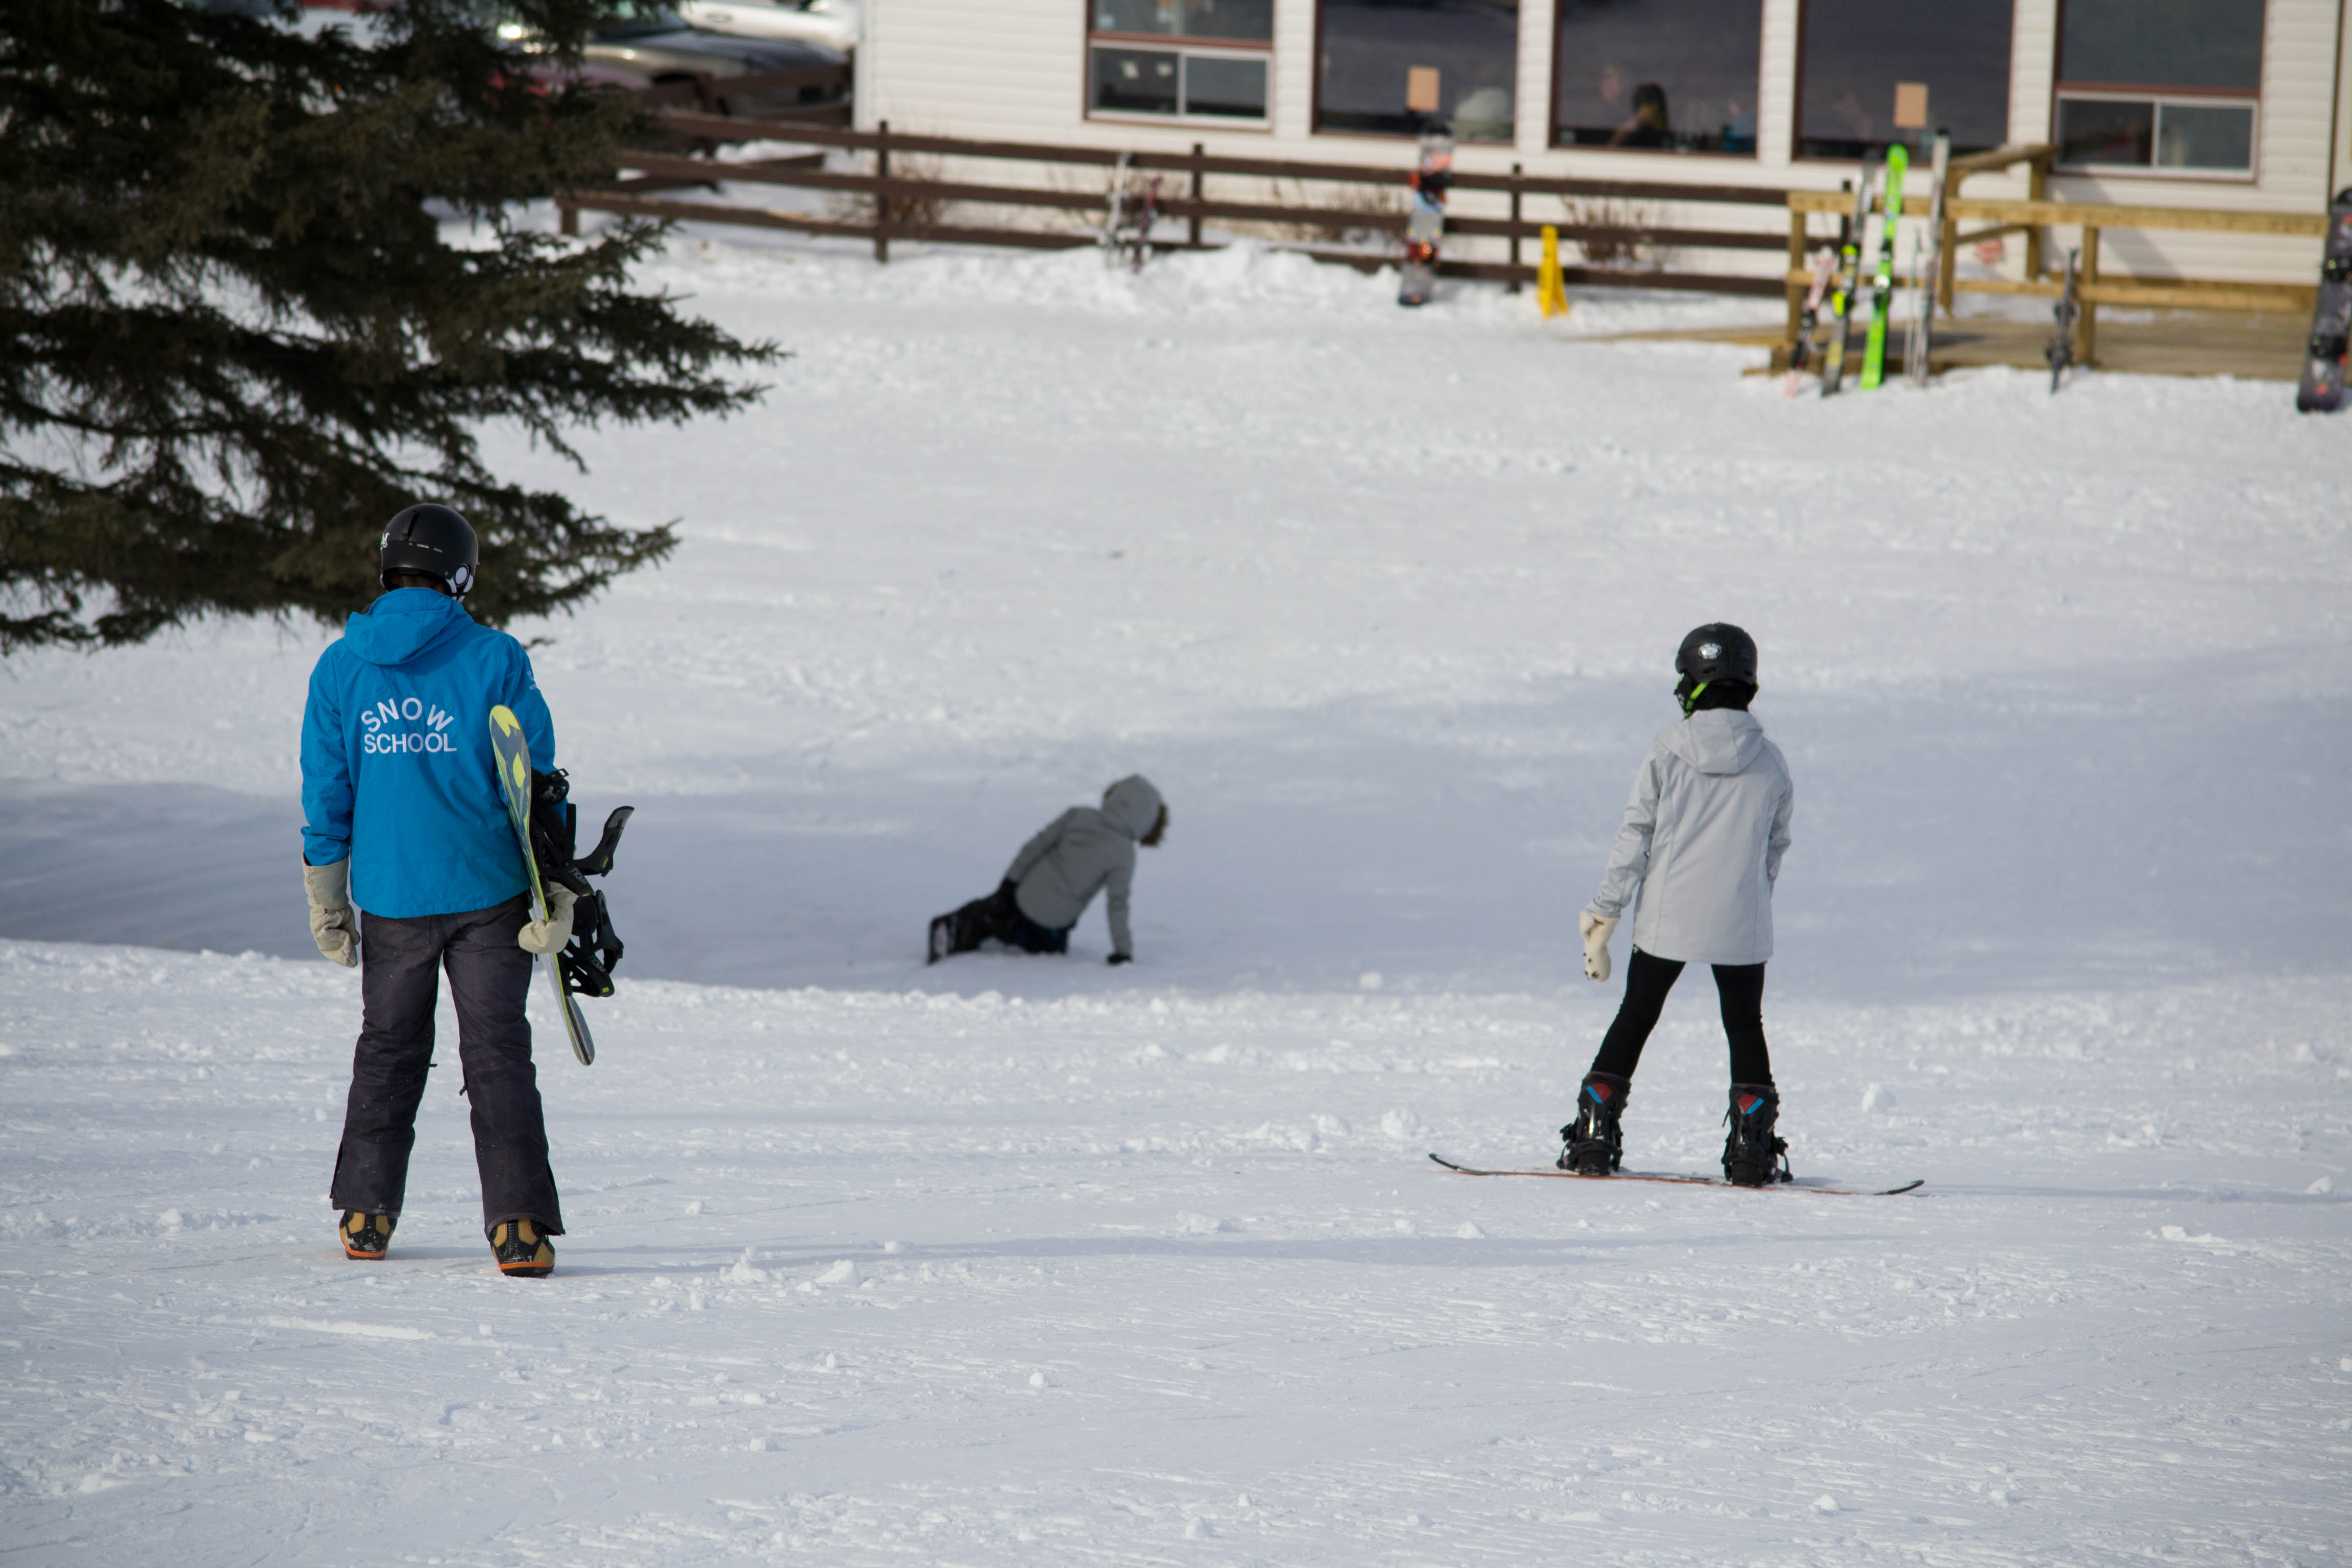 Snow school 5